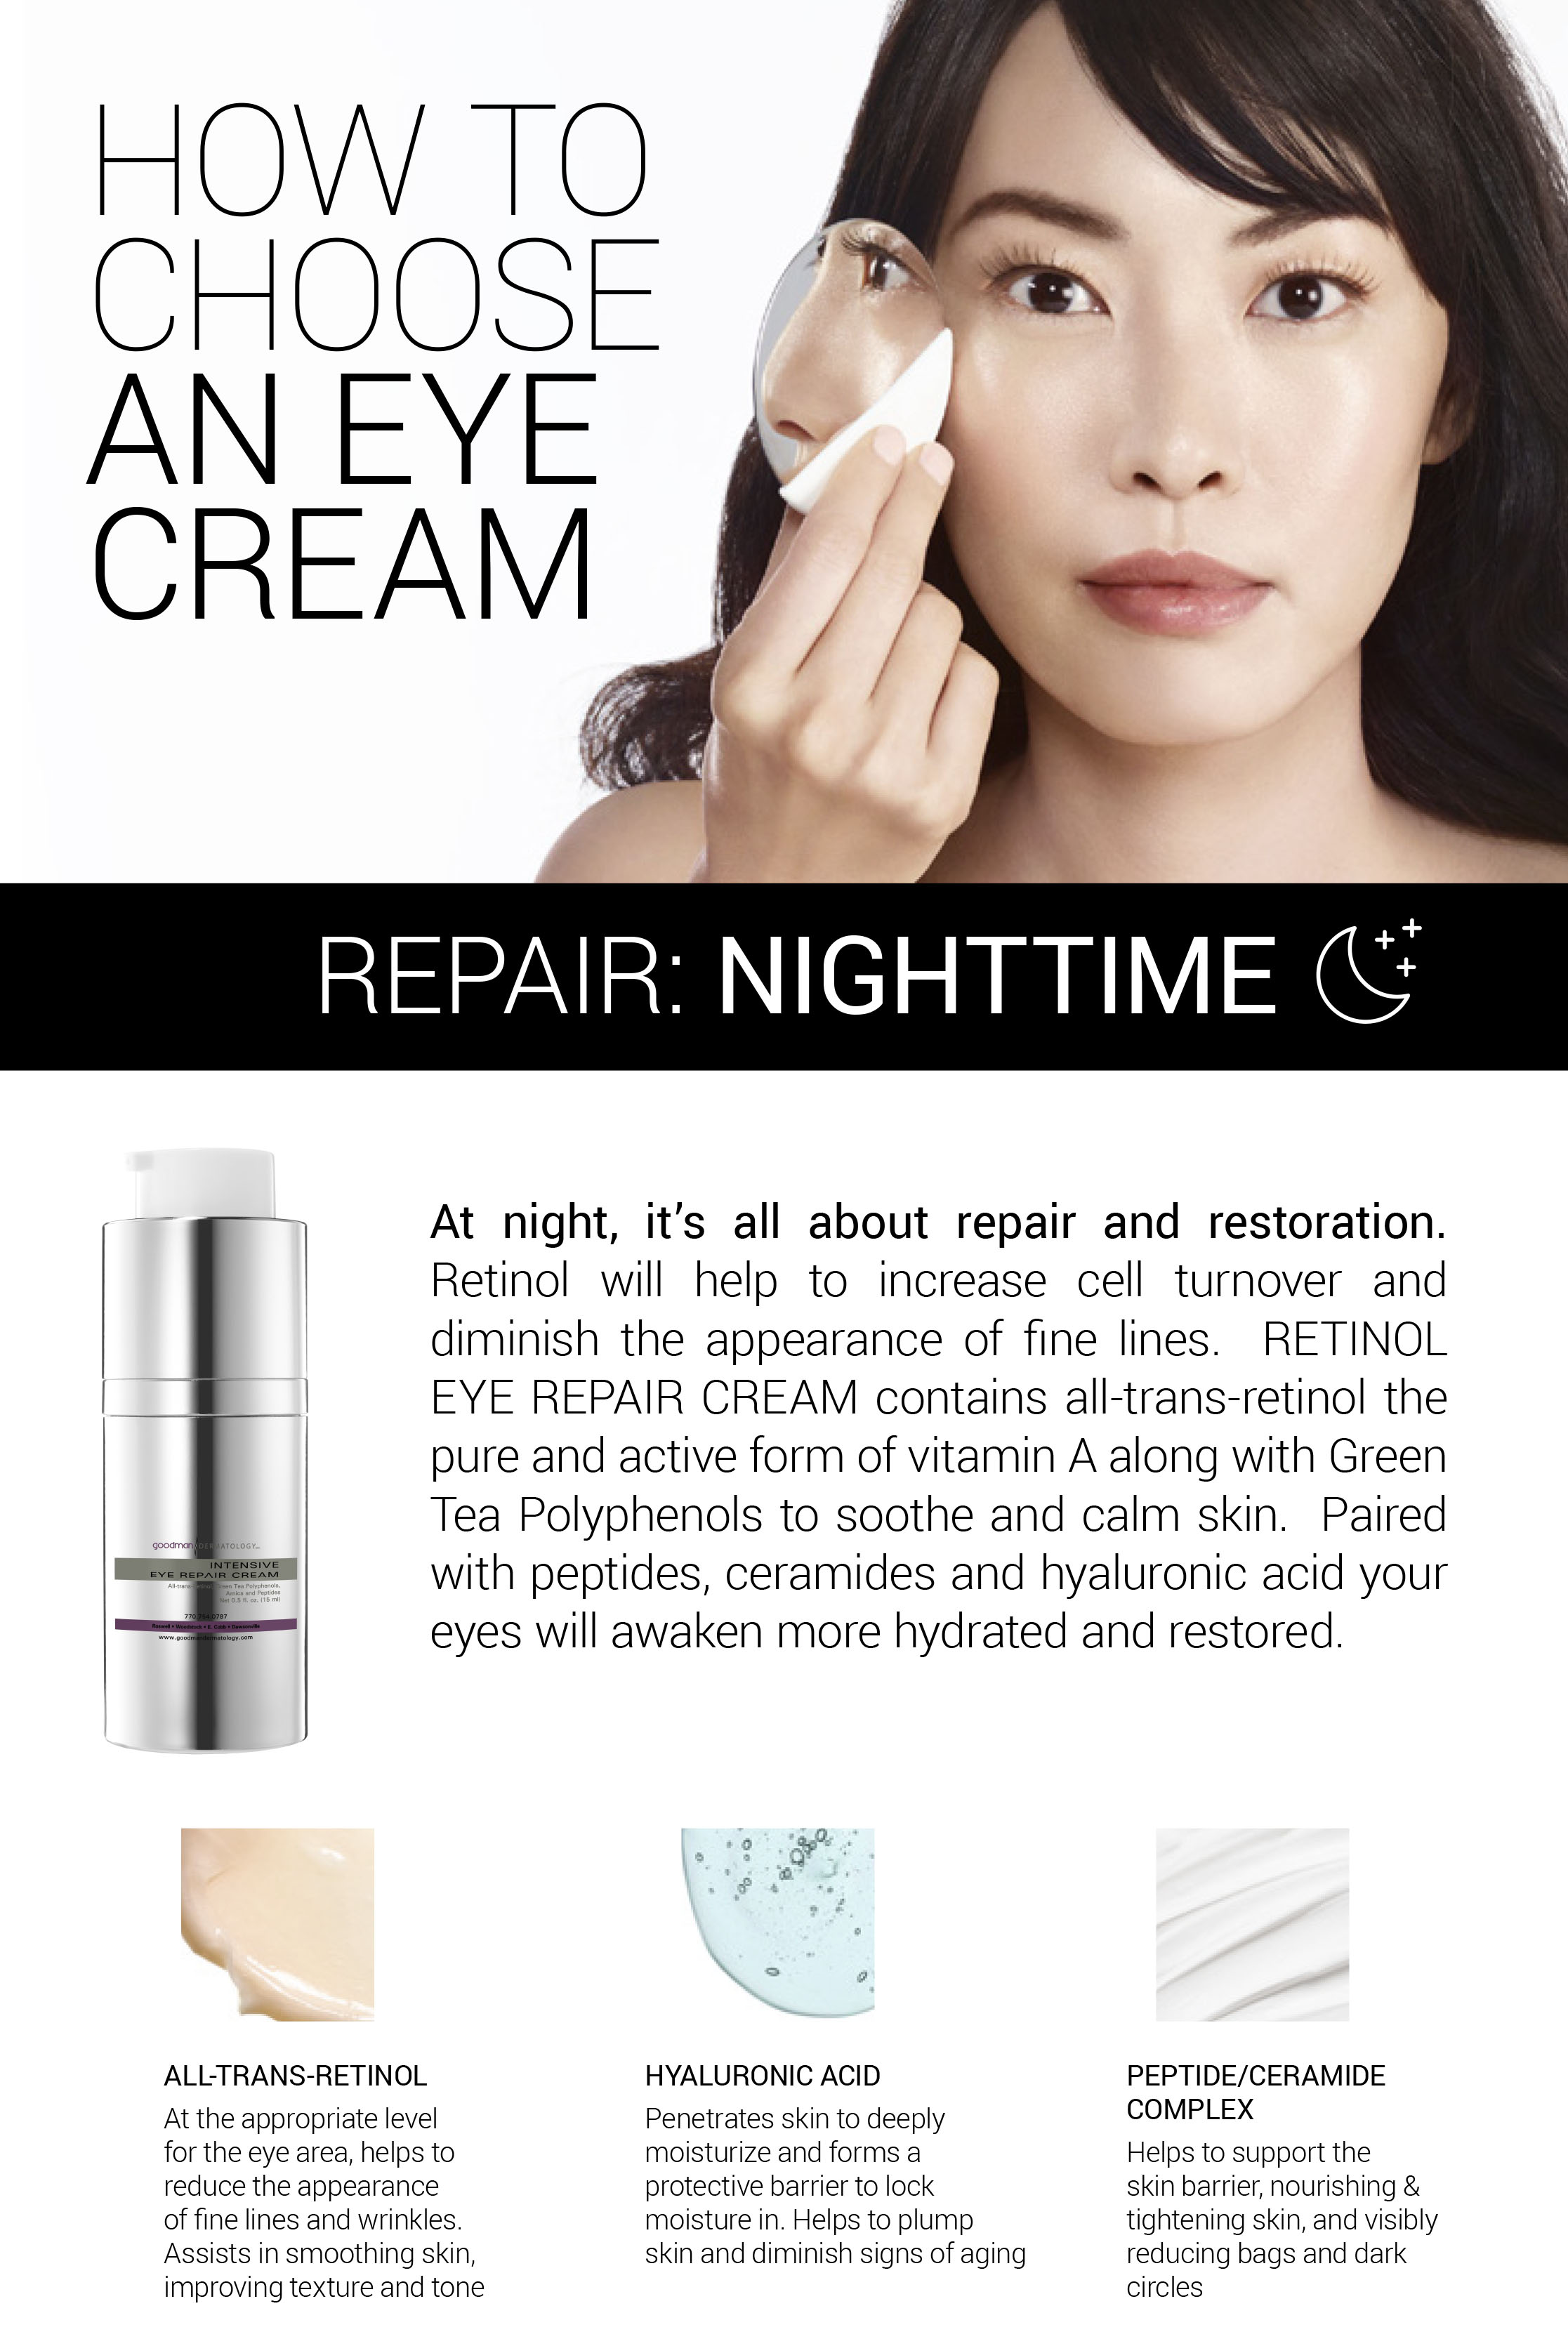 How to Choose An Eye Cream